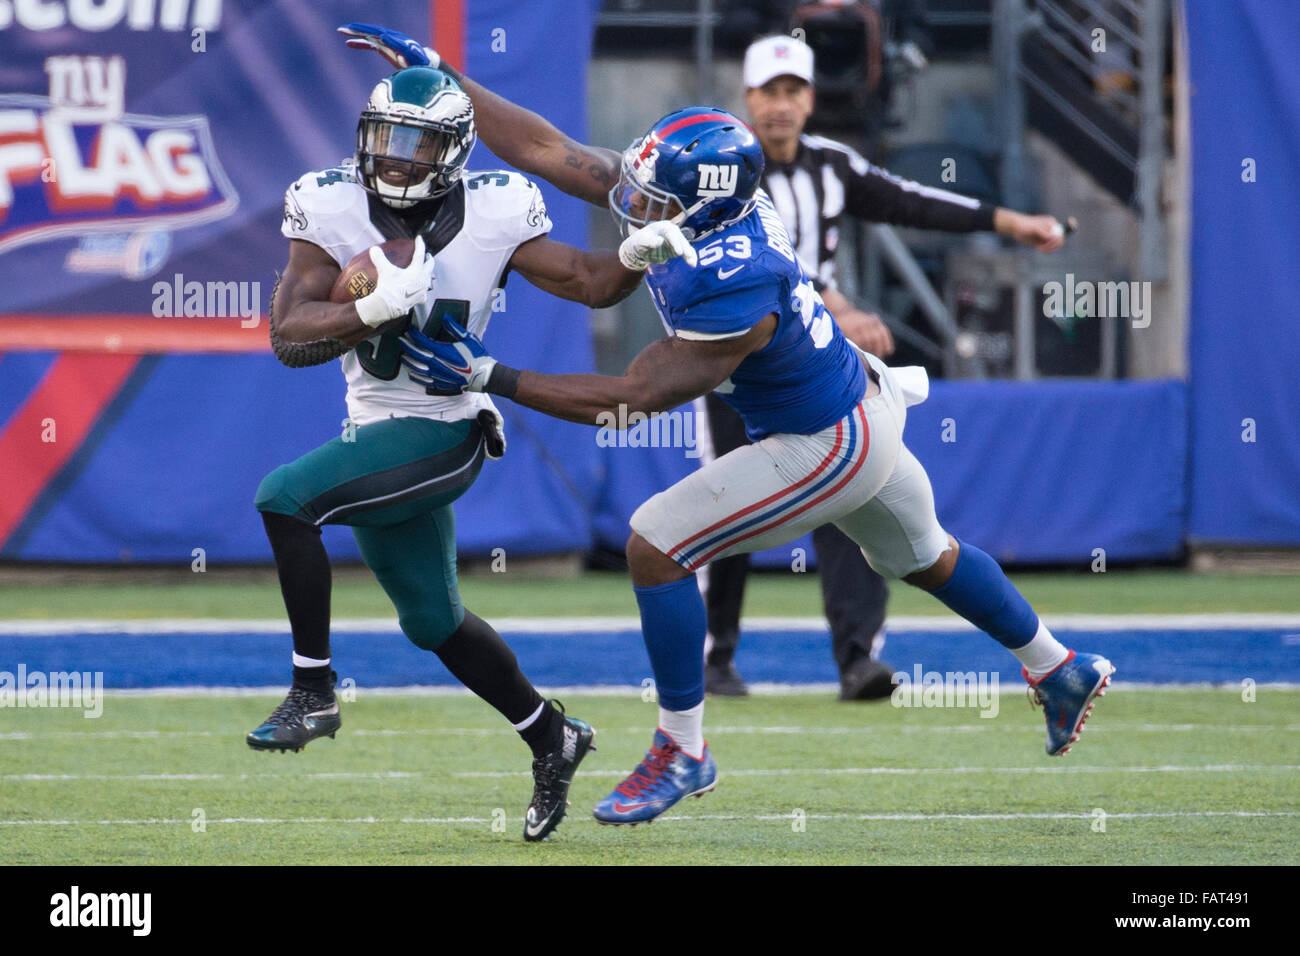 nfl GAME New York Giants Jasper Brinkley Jerseys